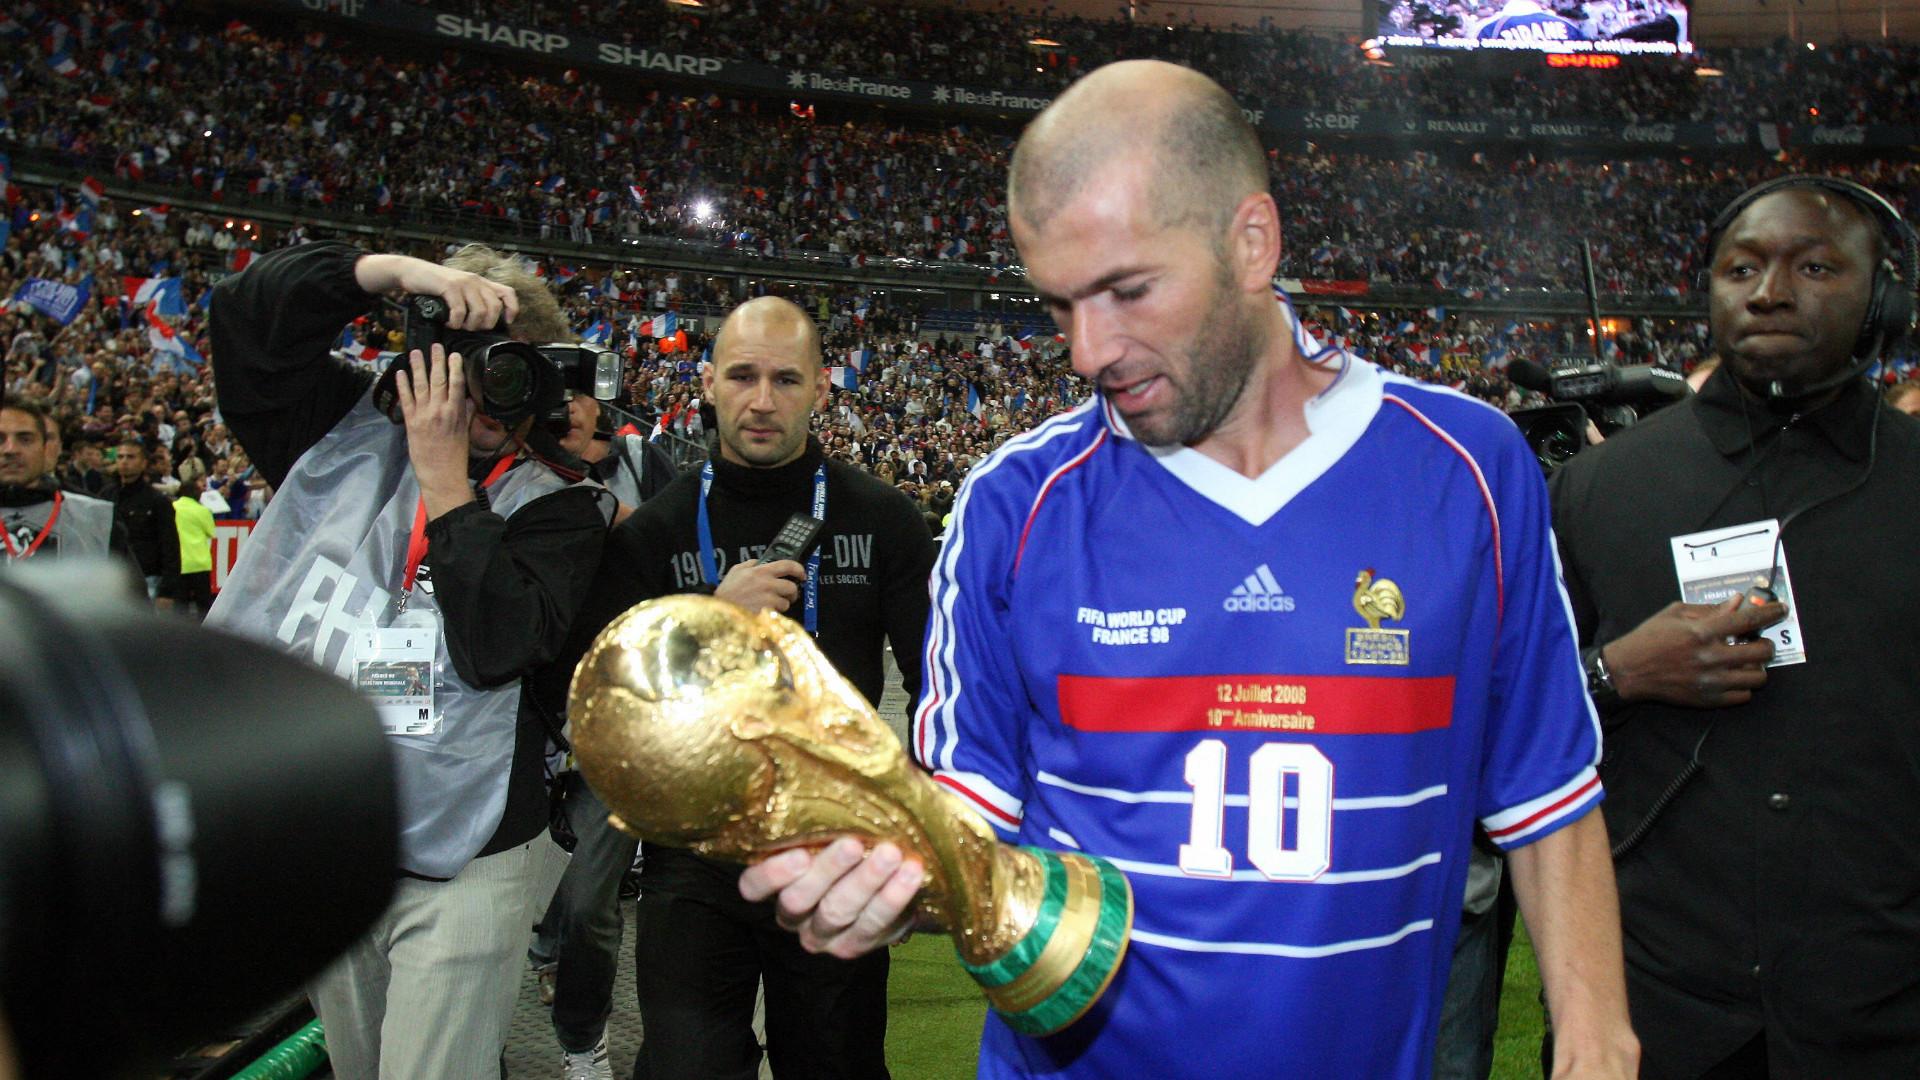 Zinedine Zidane France Brazil 1998 World Cup Final 1998